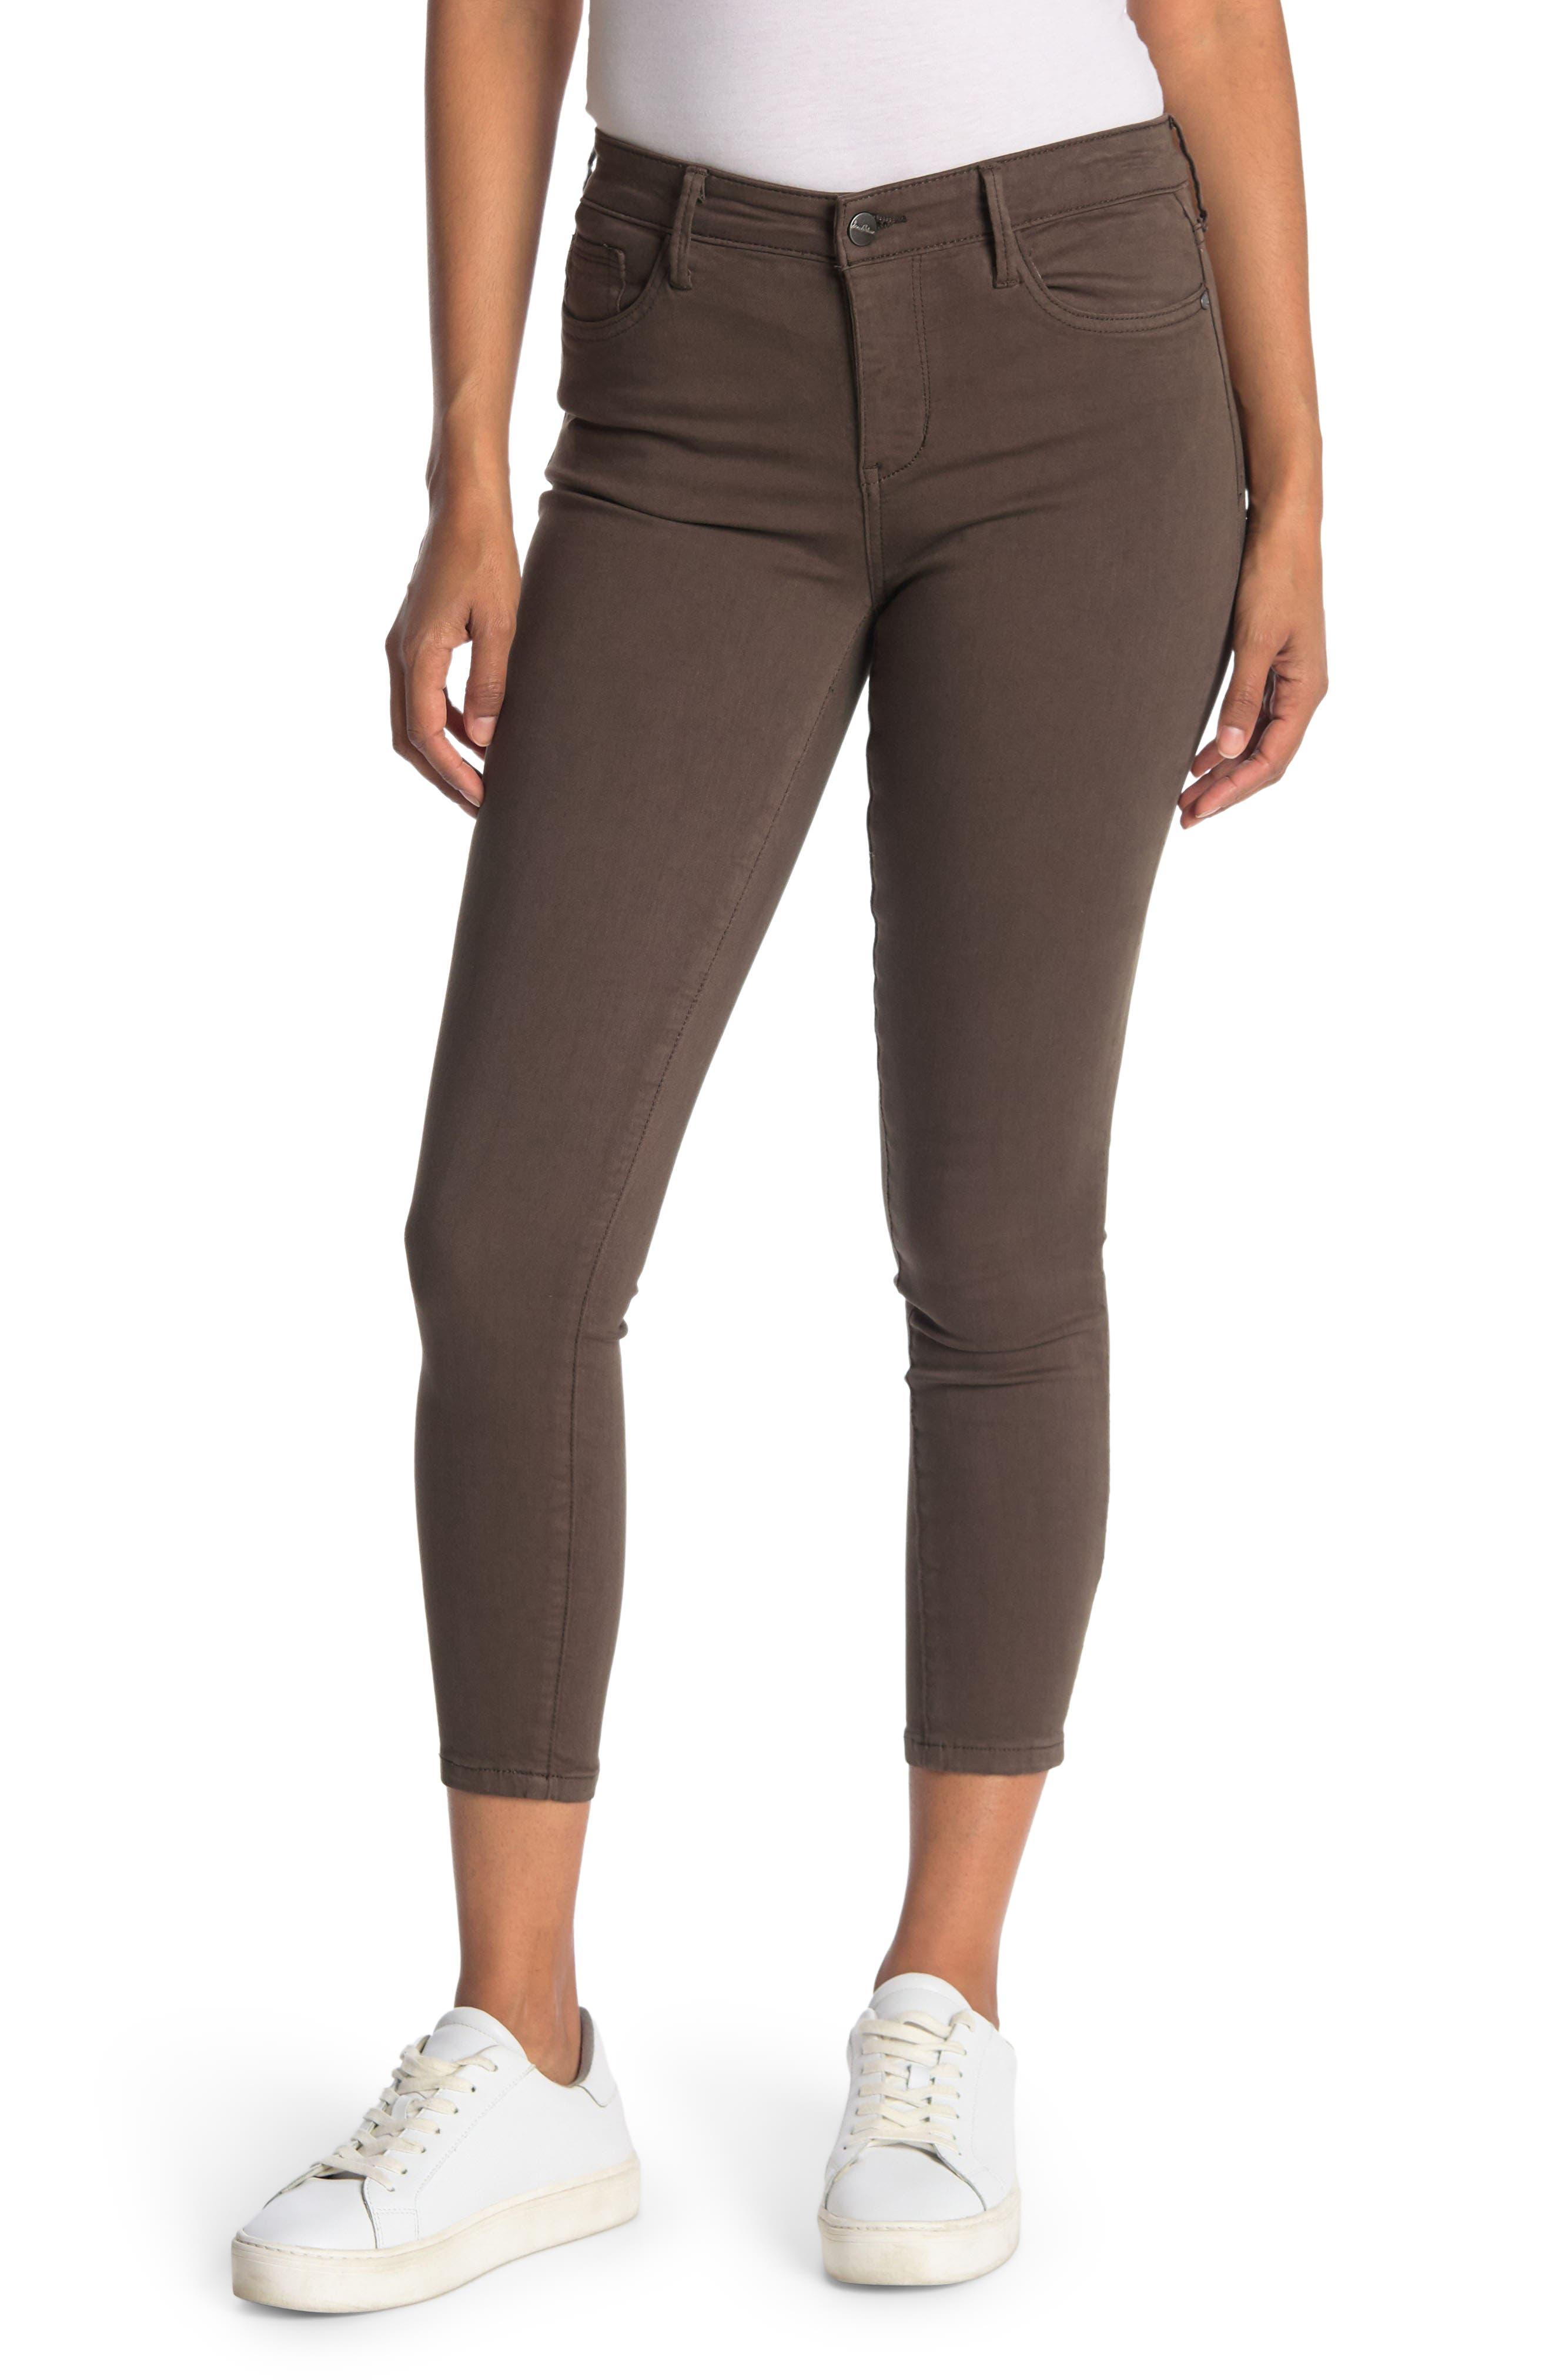 Image of Sam Edelman Skinny Ankle Crop Jeans